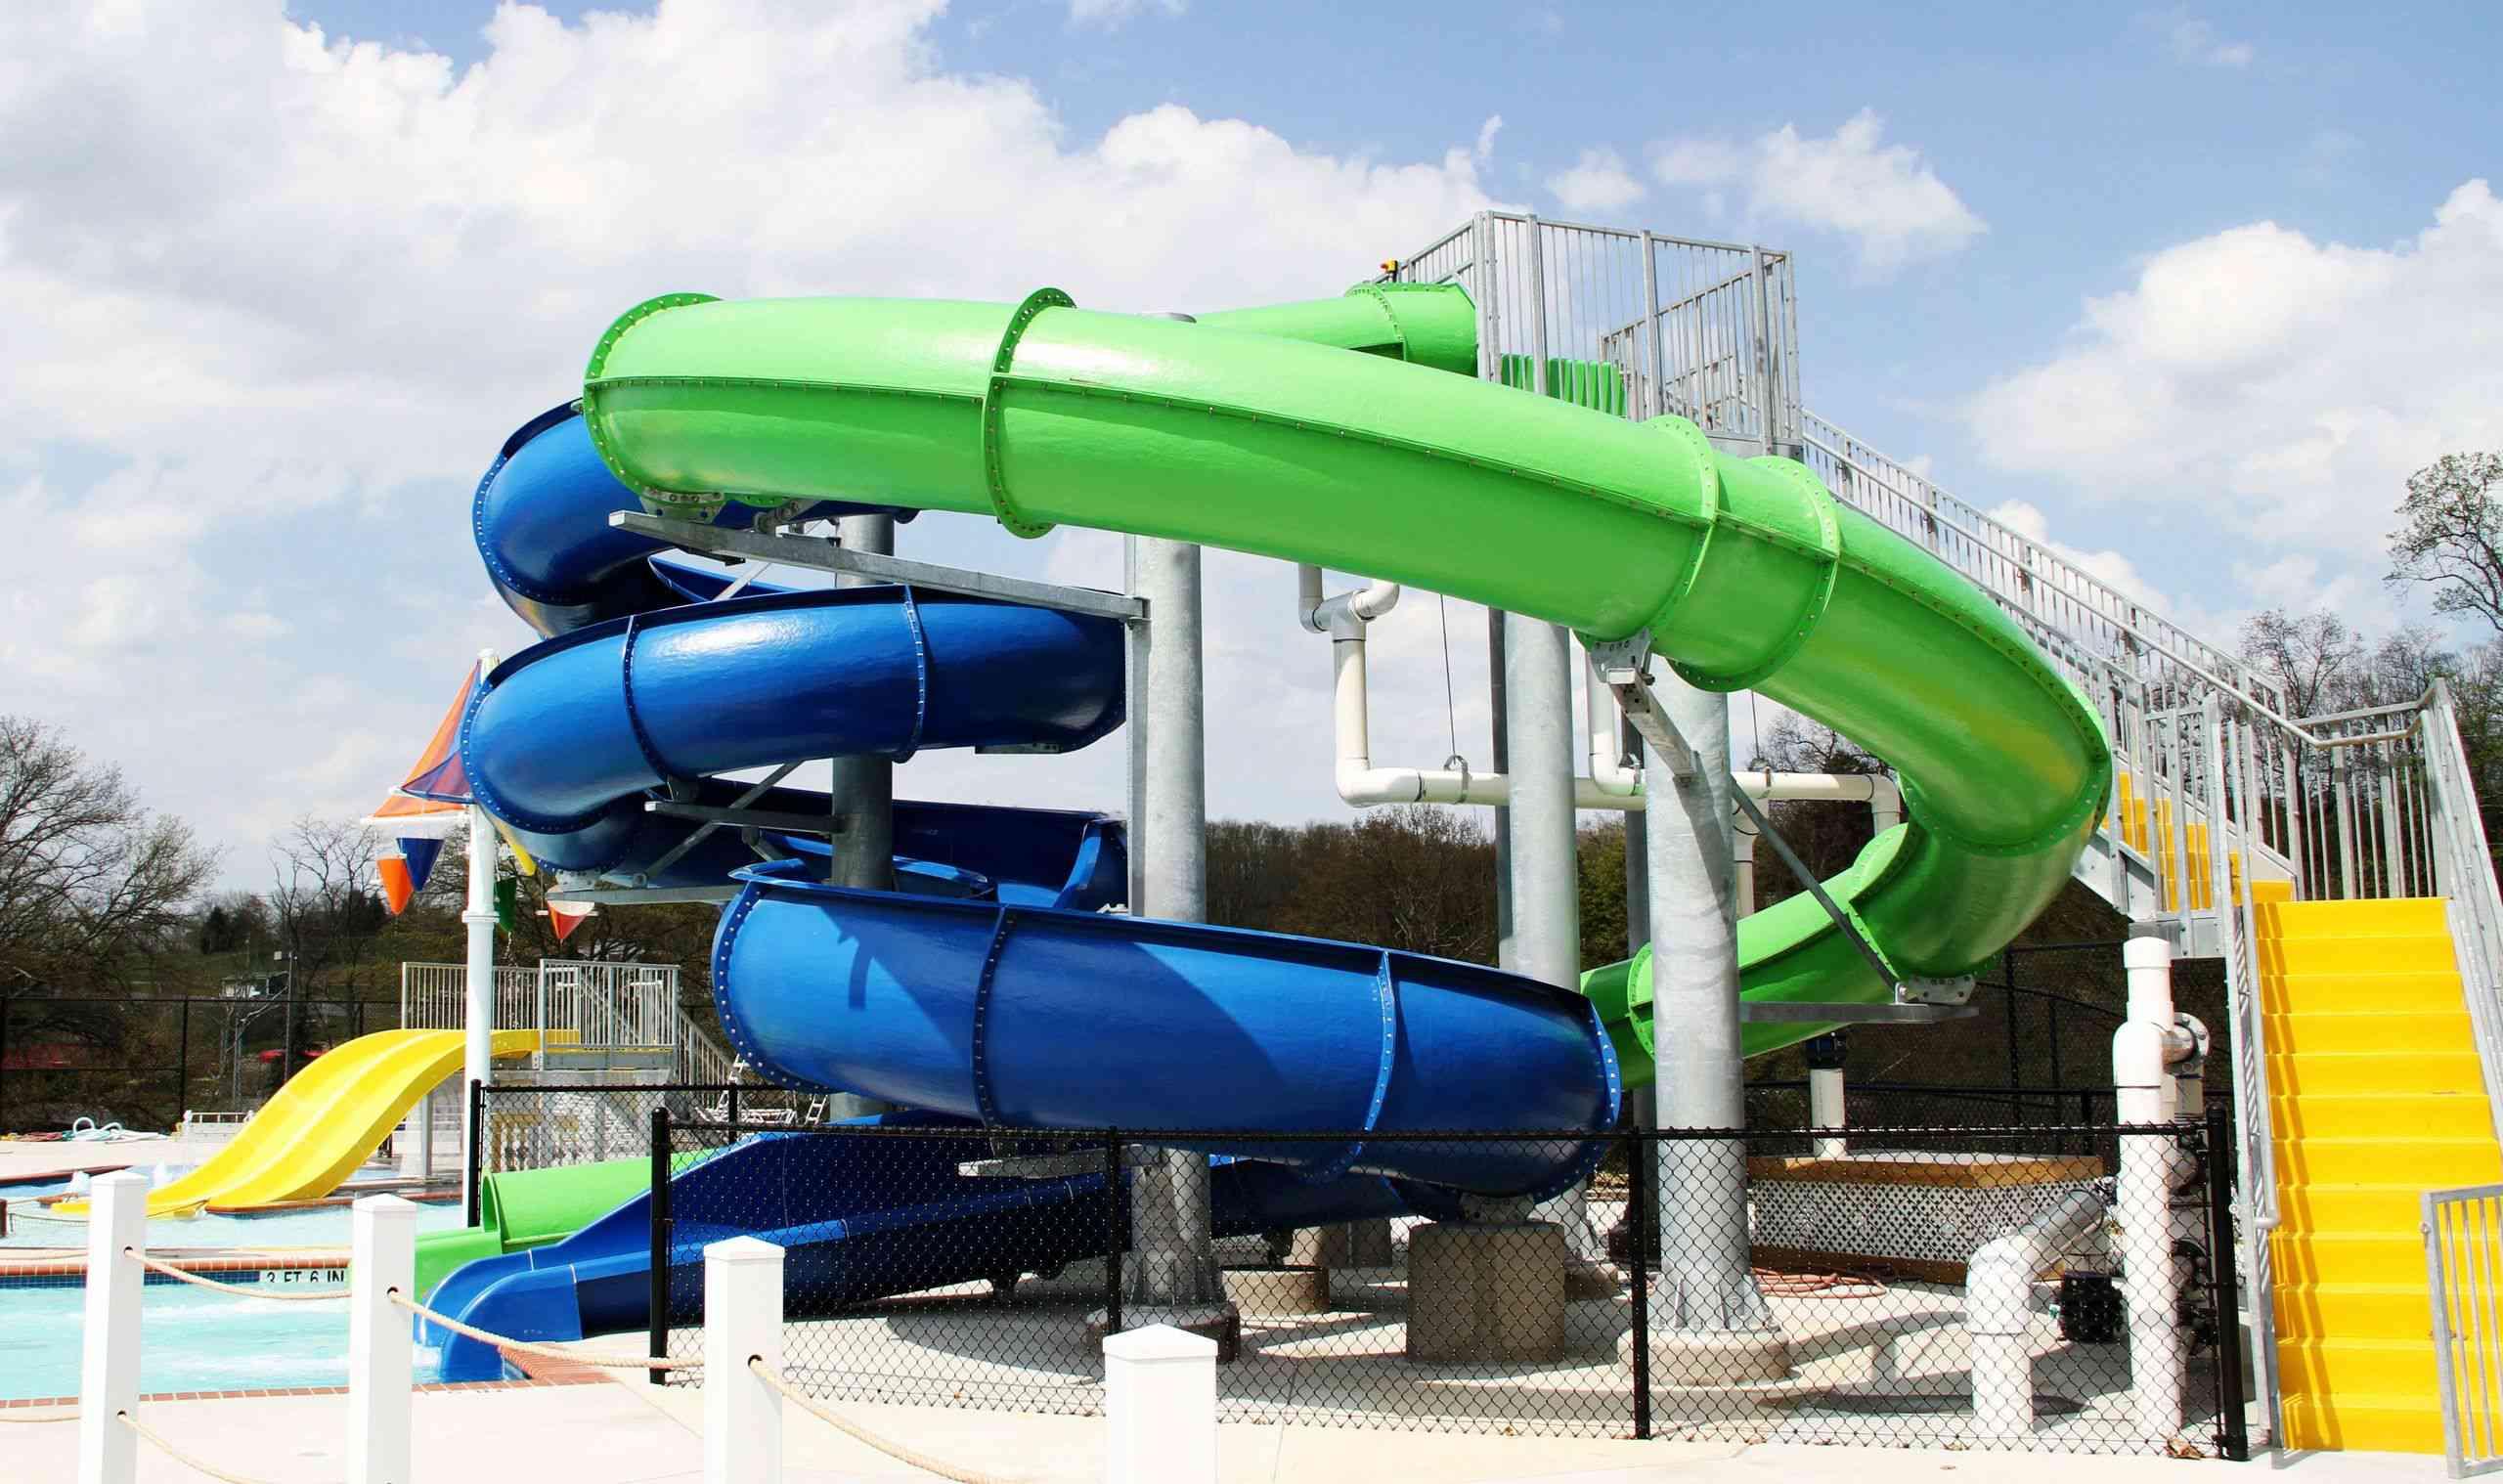 Splash Zone water park in Clarksburg West Virginia